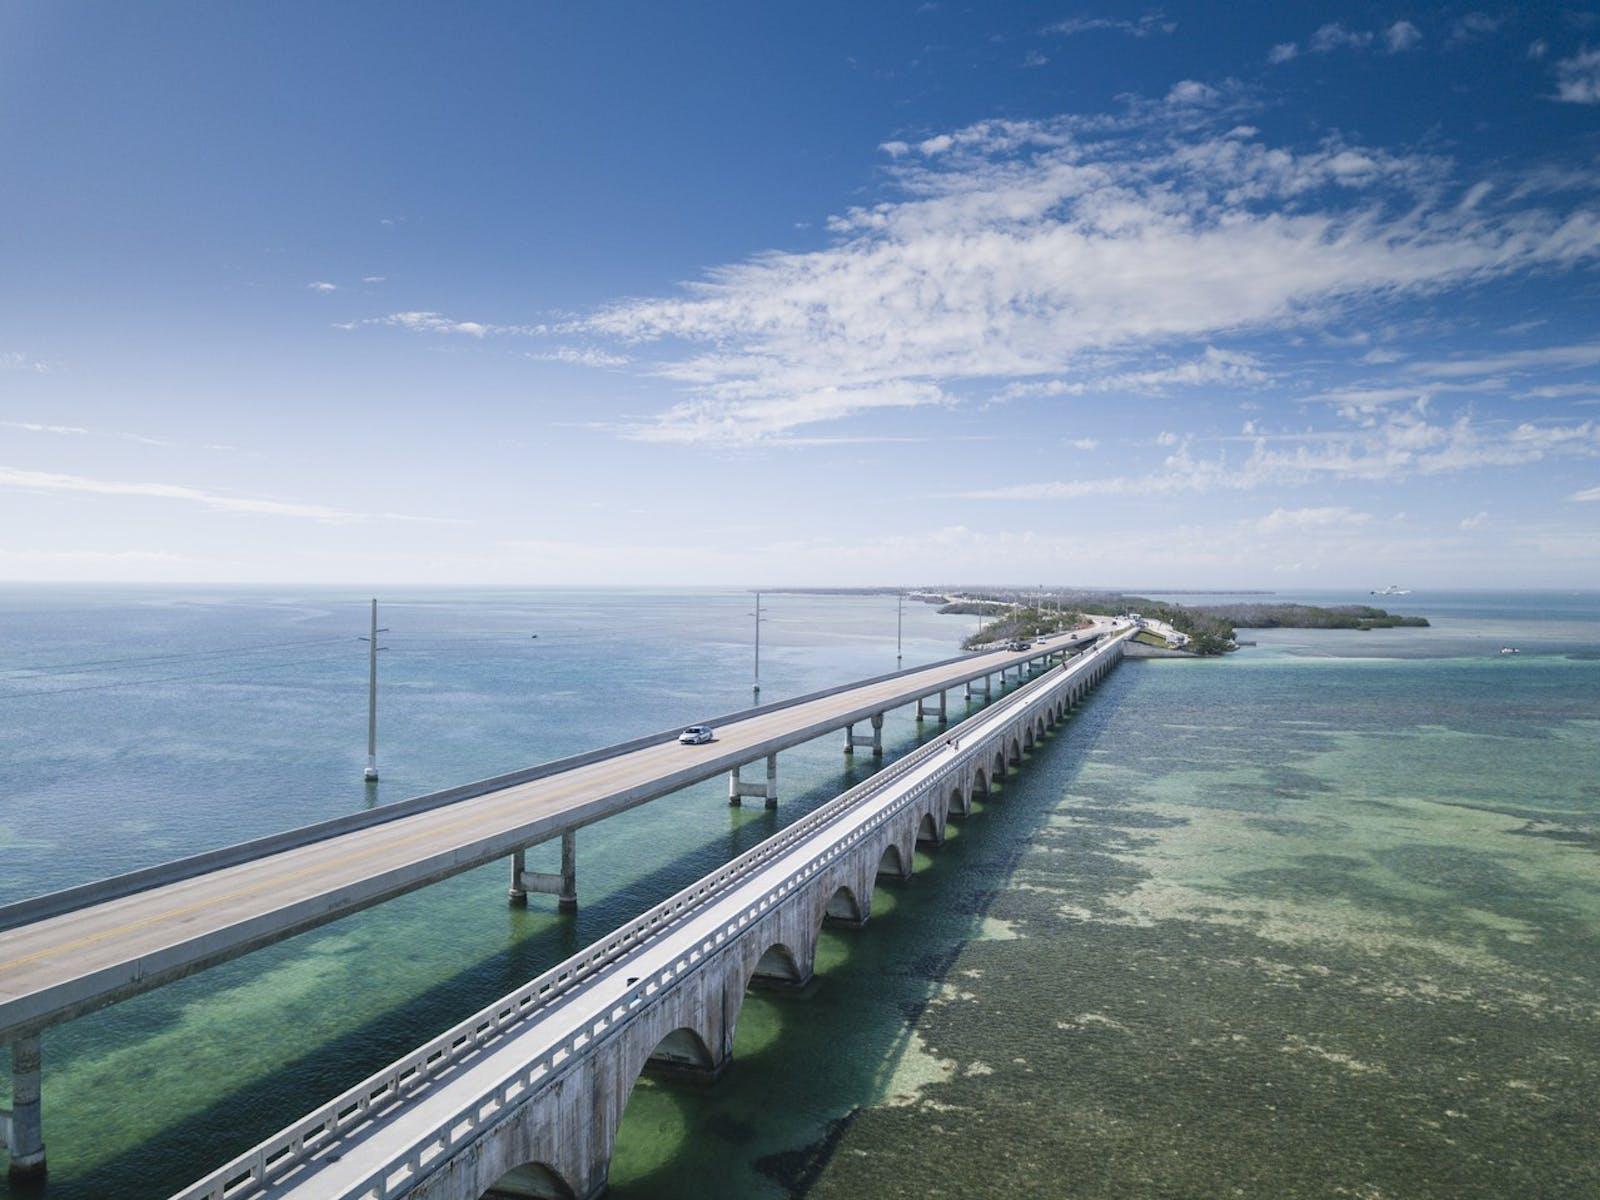 Roadway over the ocean in Marathon, FL